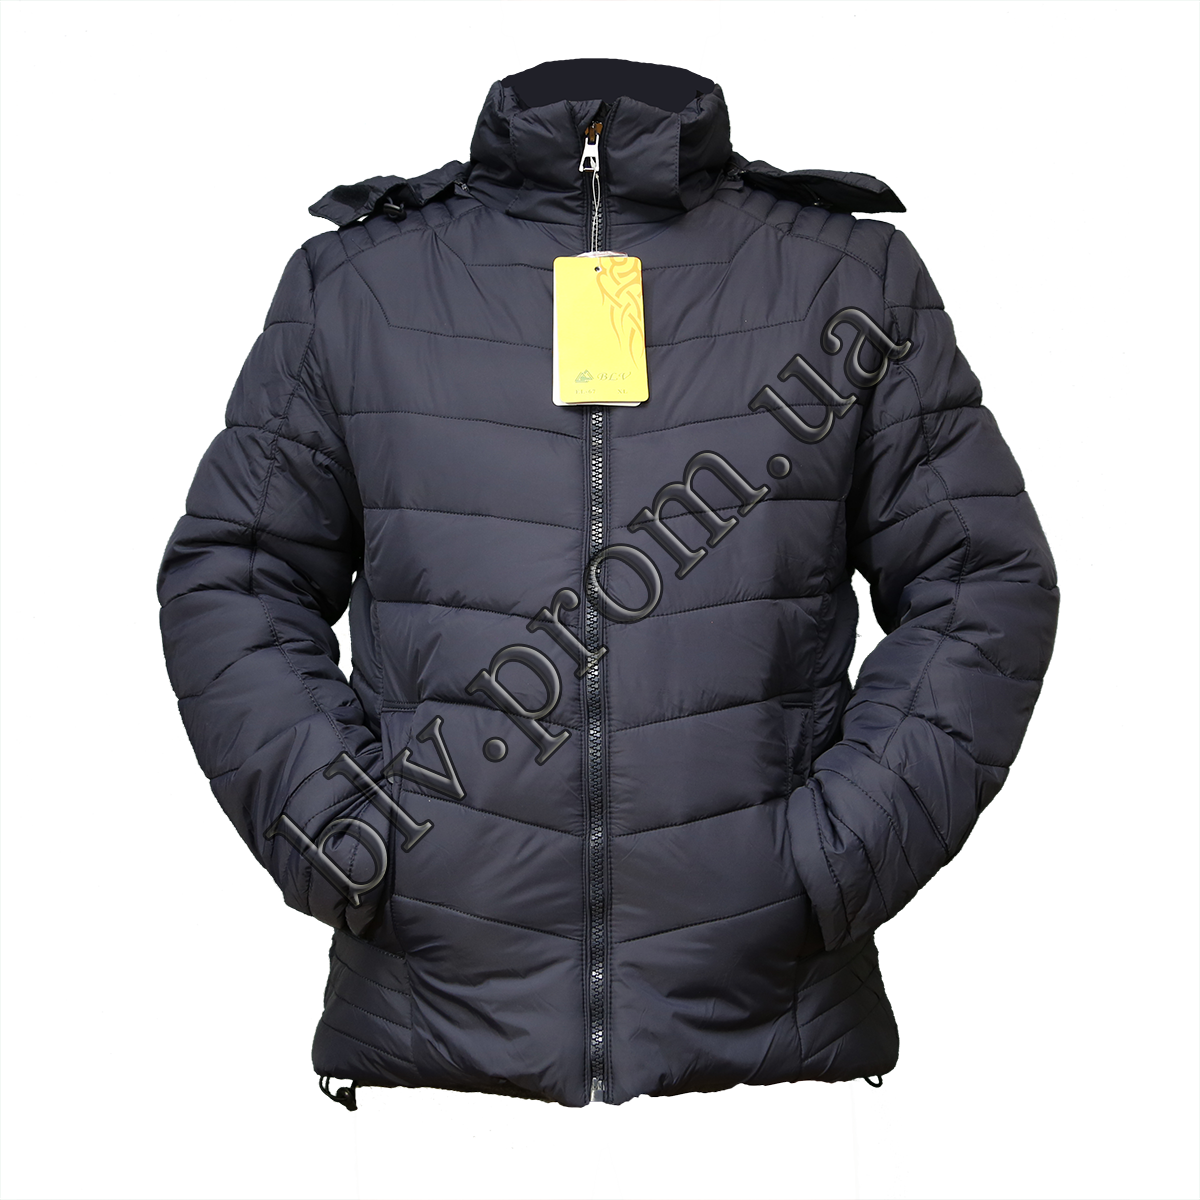 "Зимняя куртка мужская теплая на синтепоне тм. ""Boulevard""  EL-67 Dark blue"